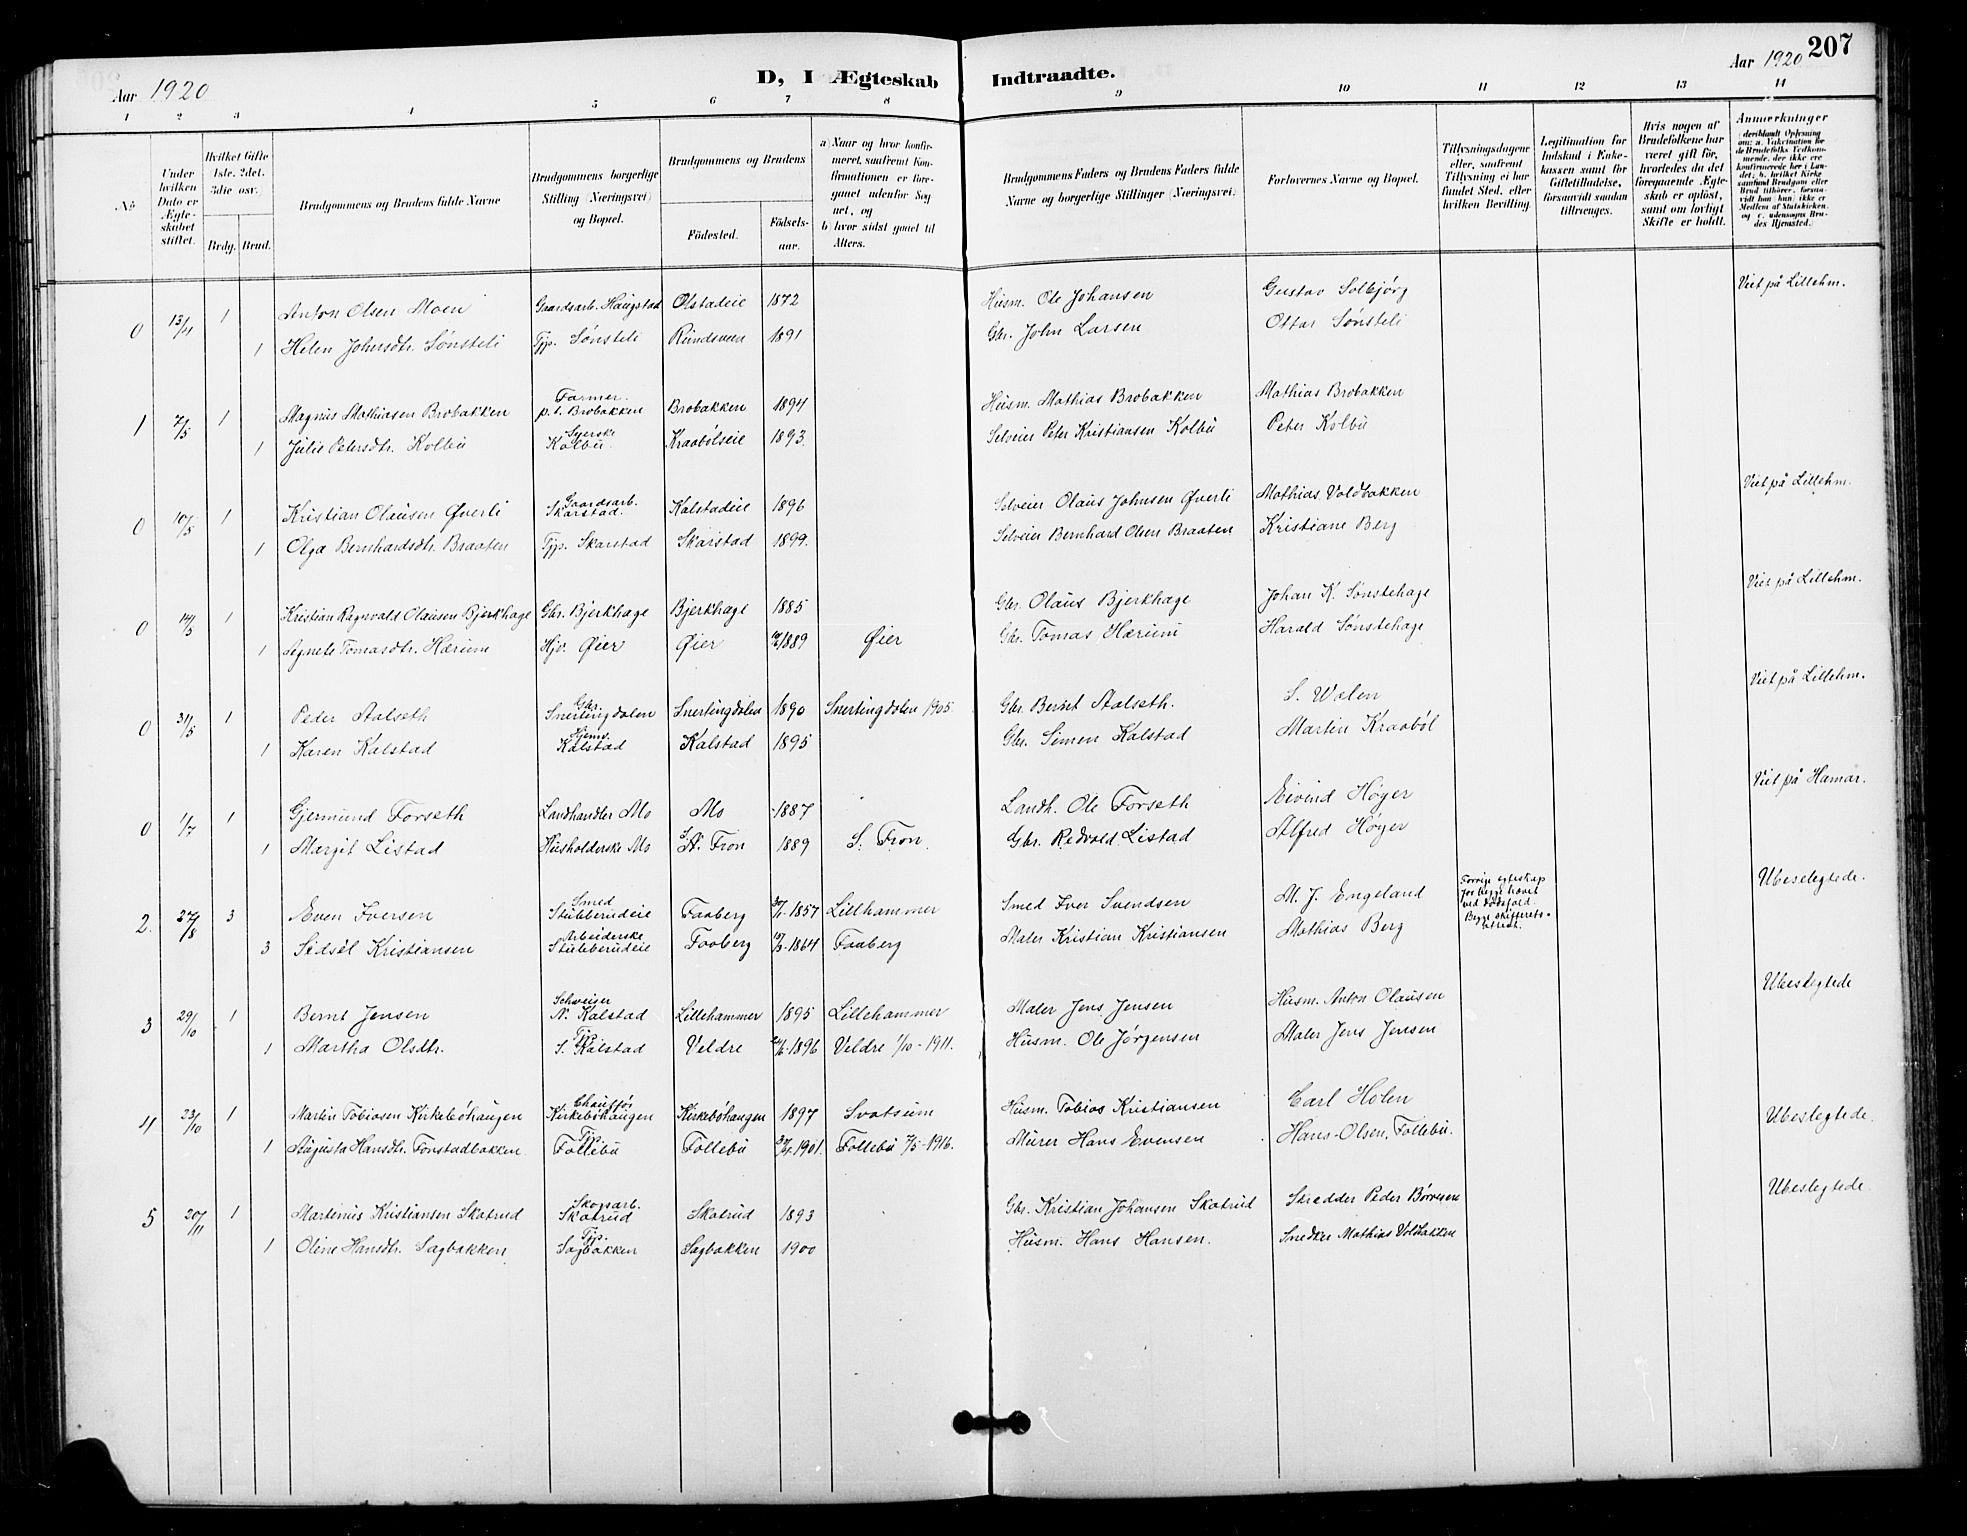 SAH, Vestre Gausdal prestekontor, Klokkerbok nr. 3, 1896-1925, s. 207